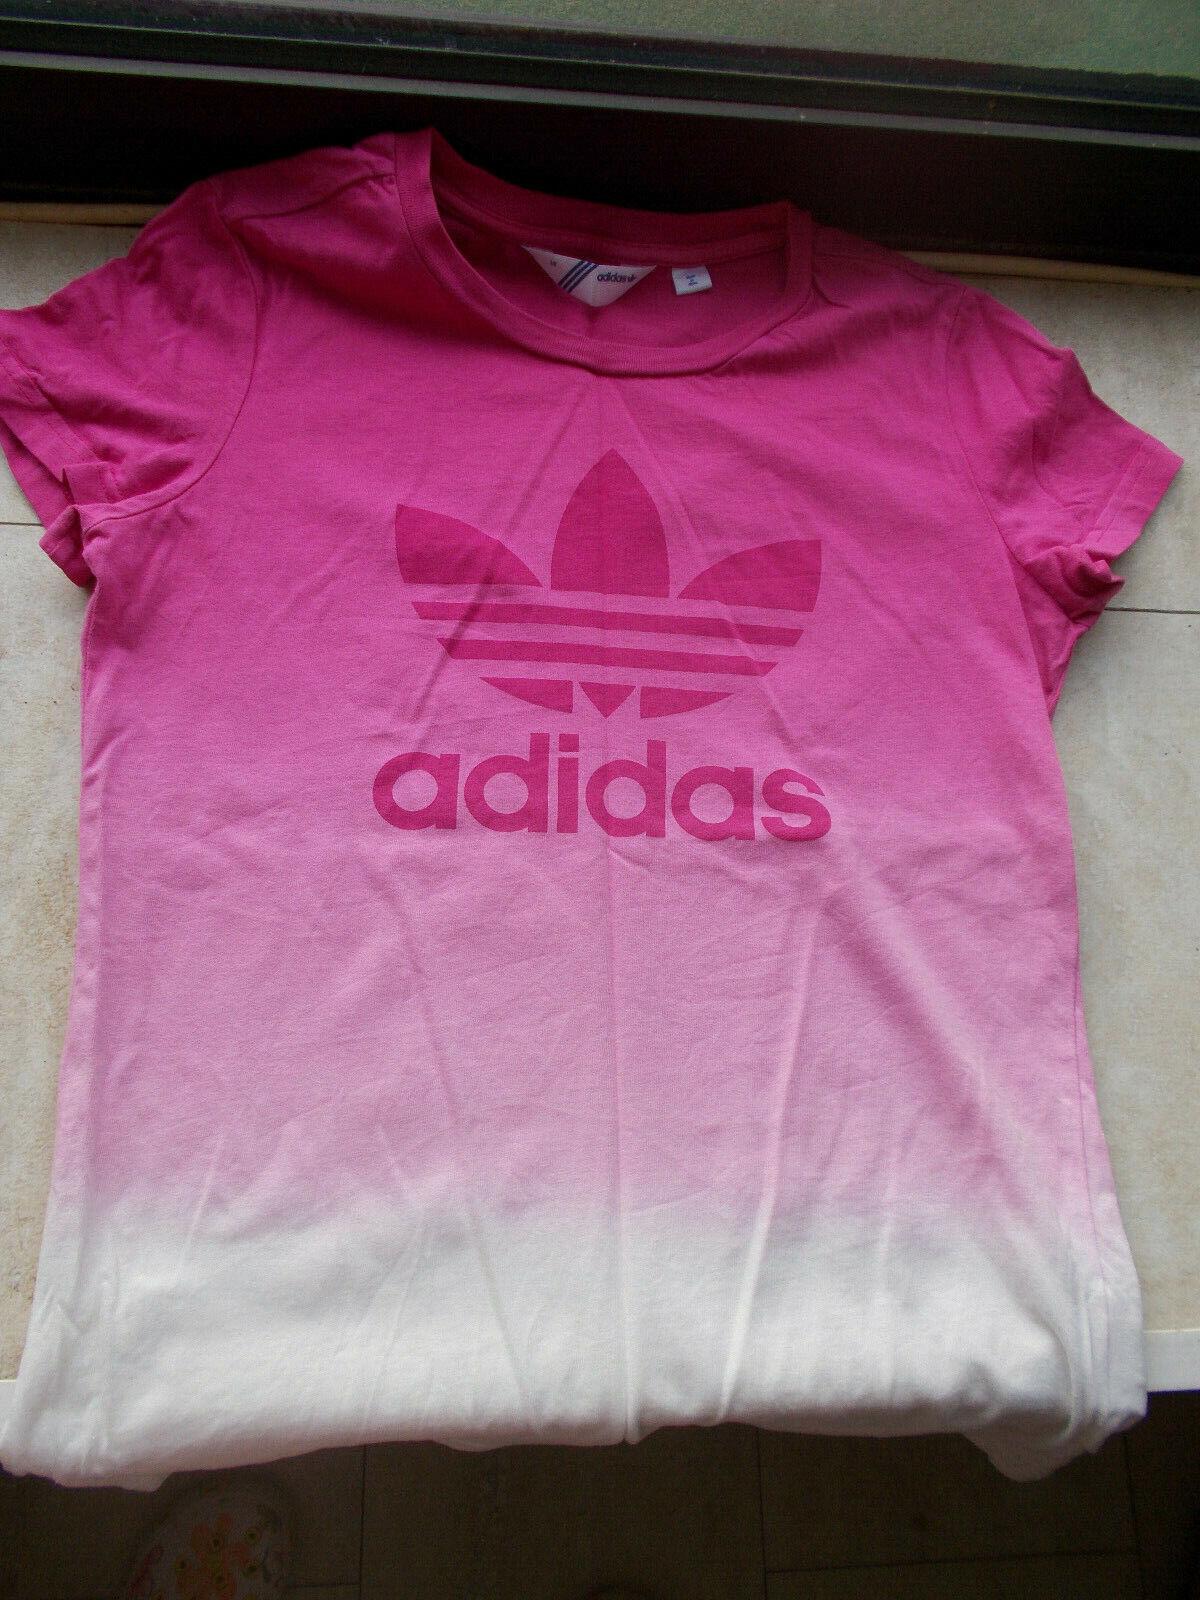 Adidas T-Shirt Größe S